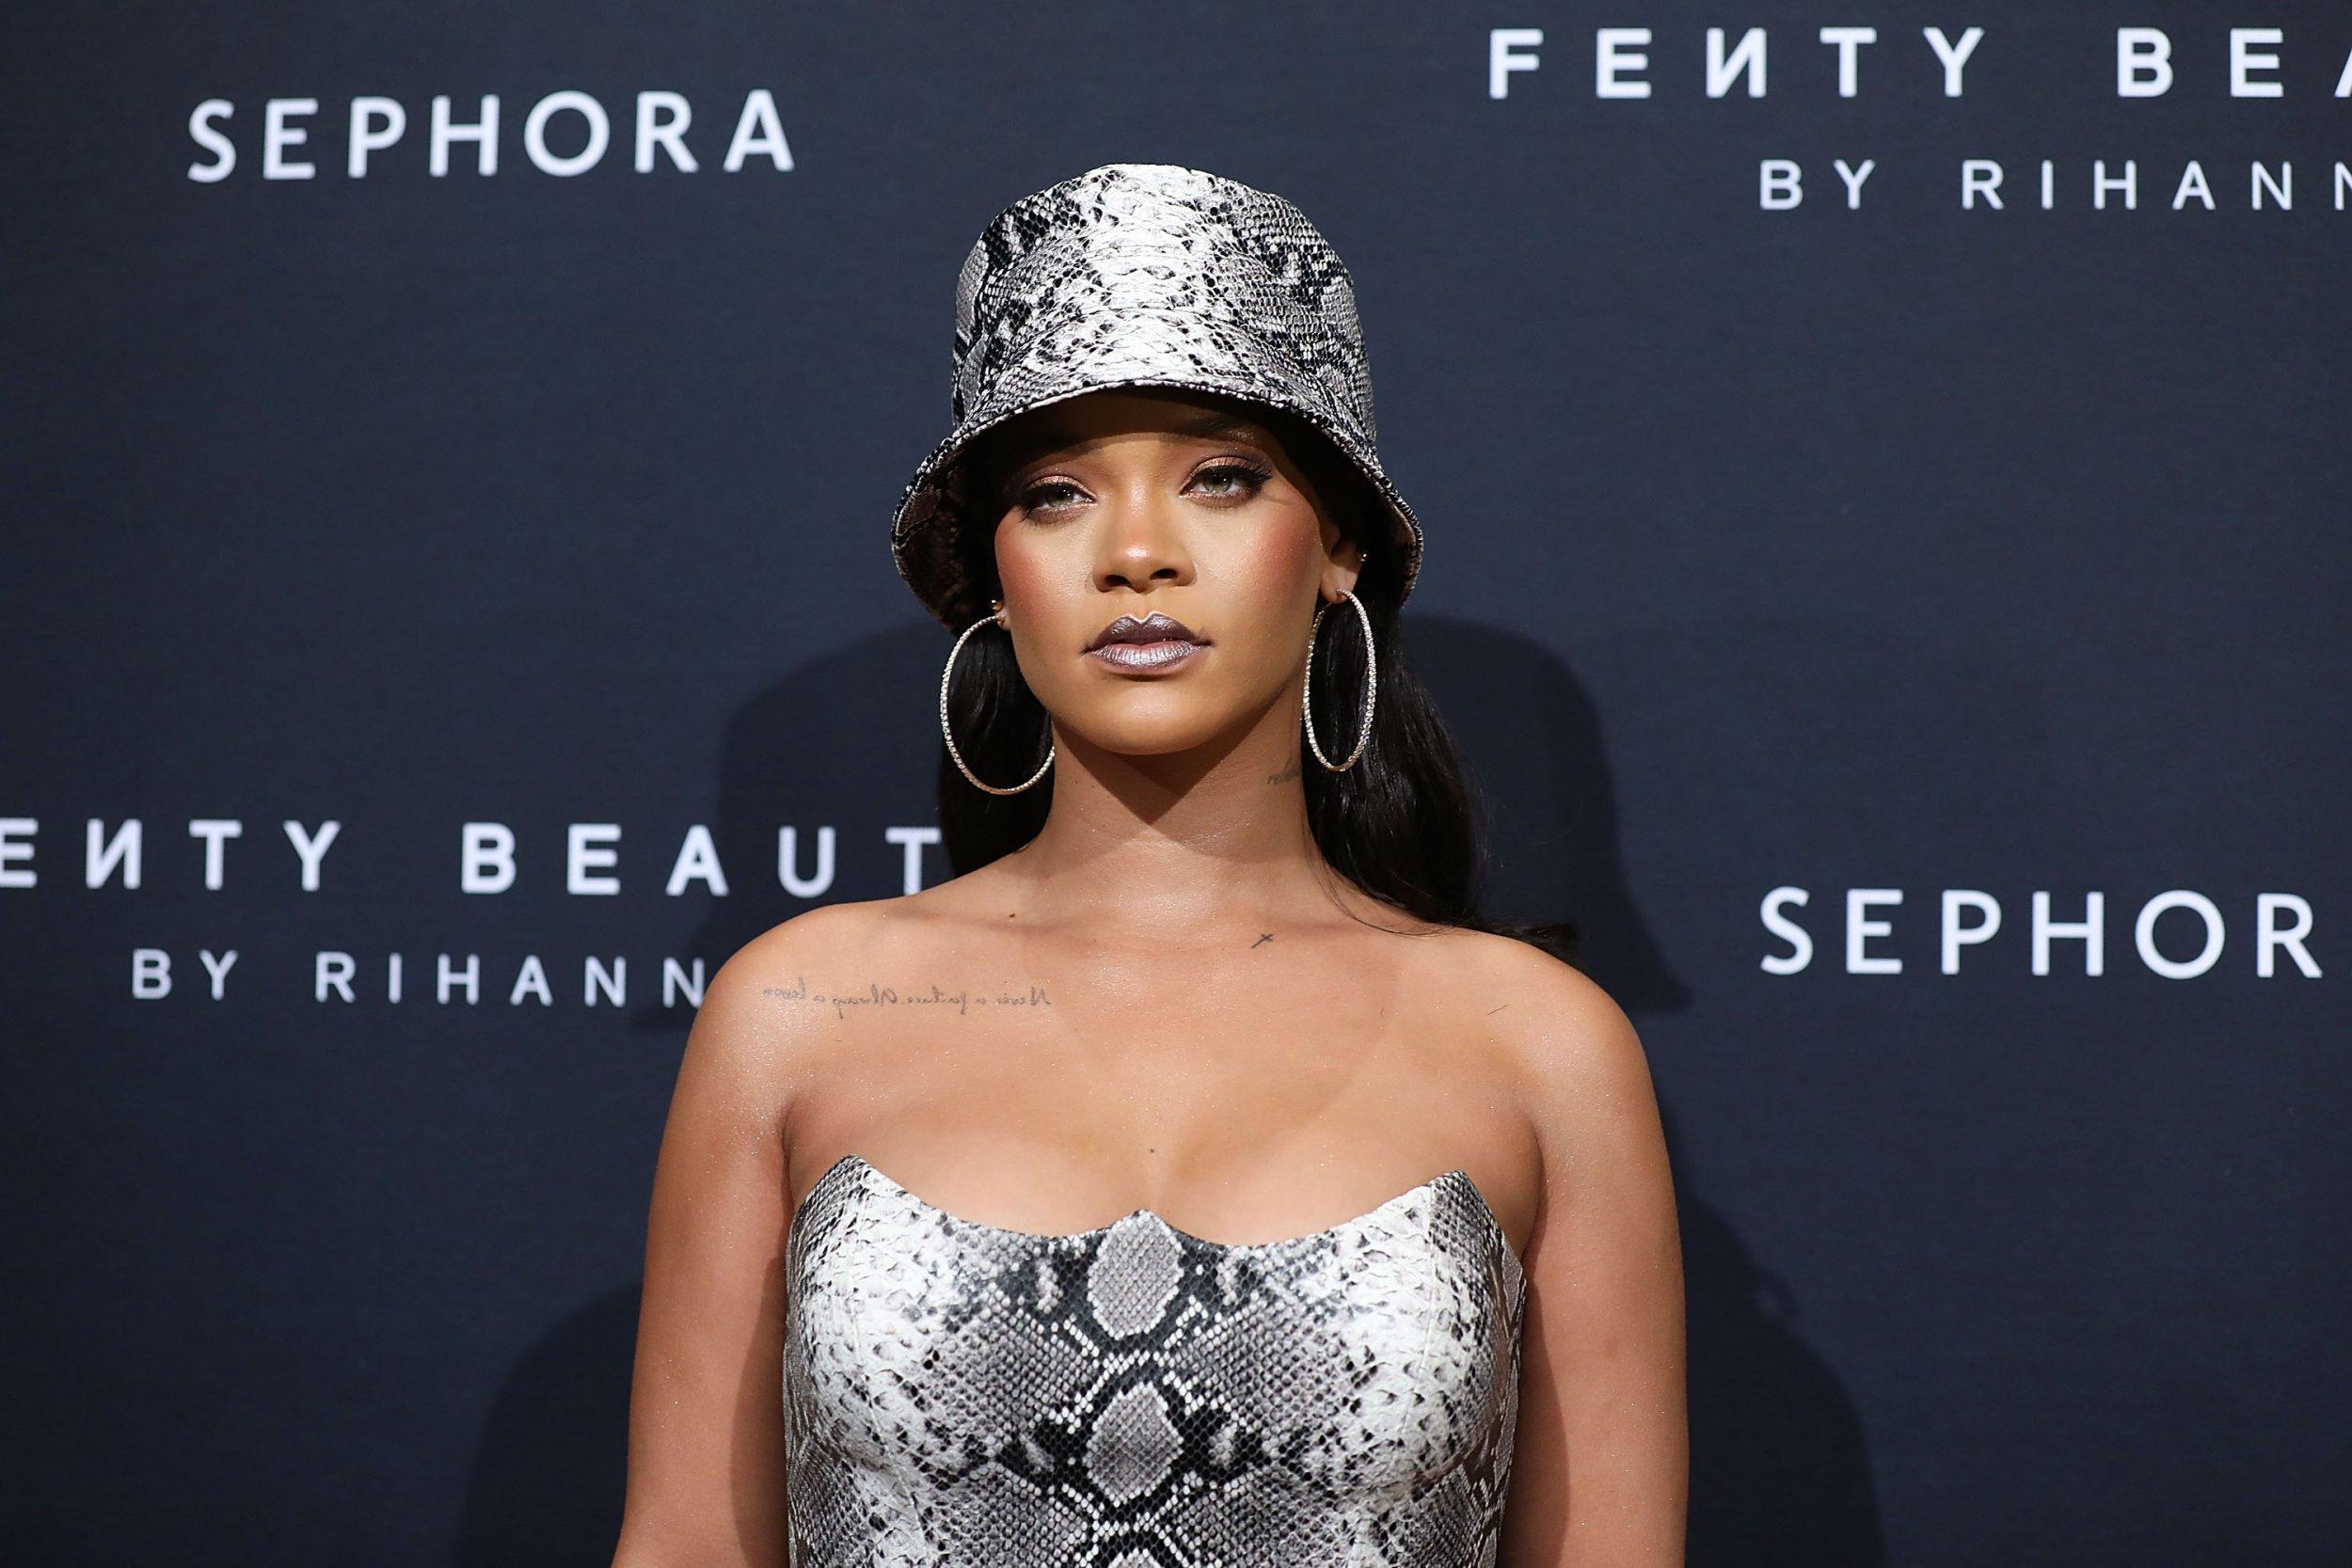 Rihanna Calling US Border Patrols Actions on Migrants 'Terrorism'